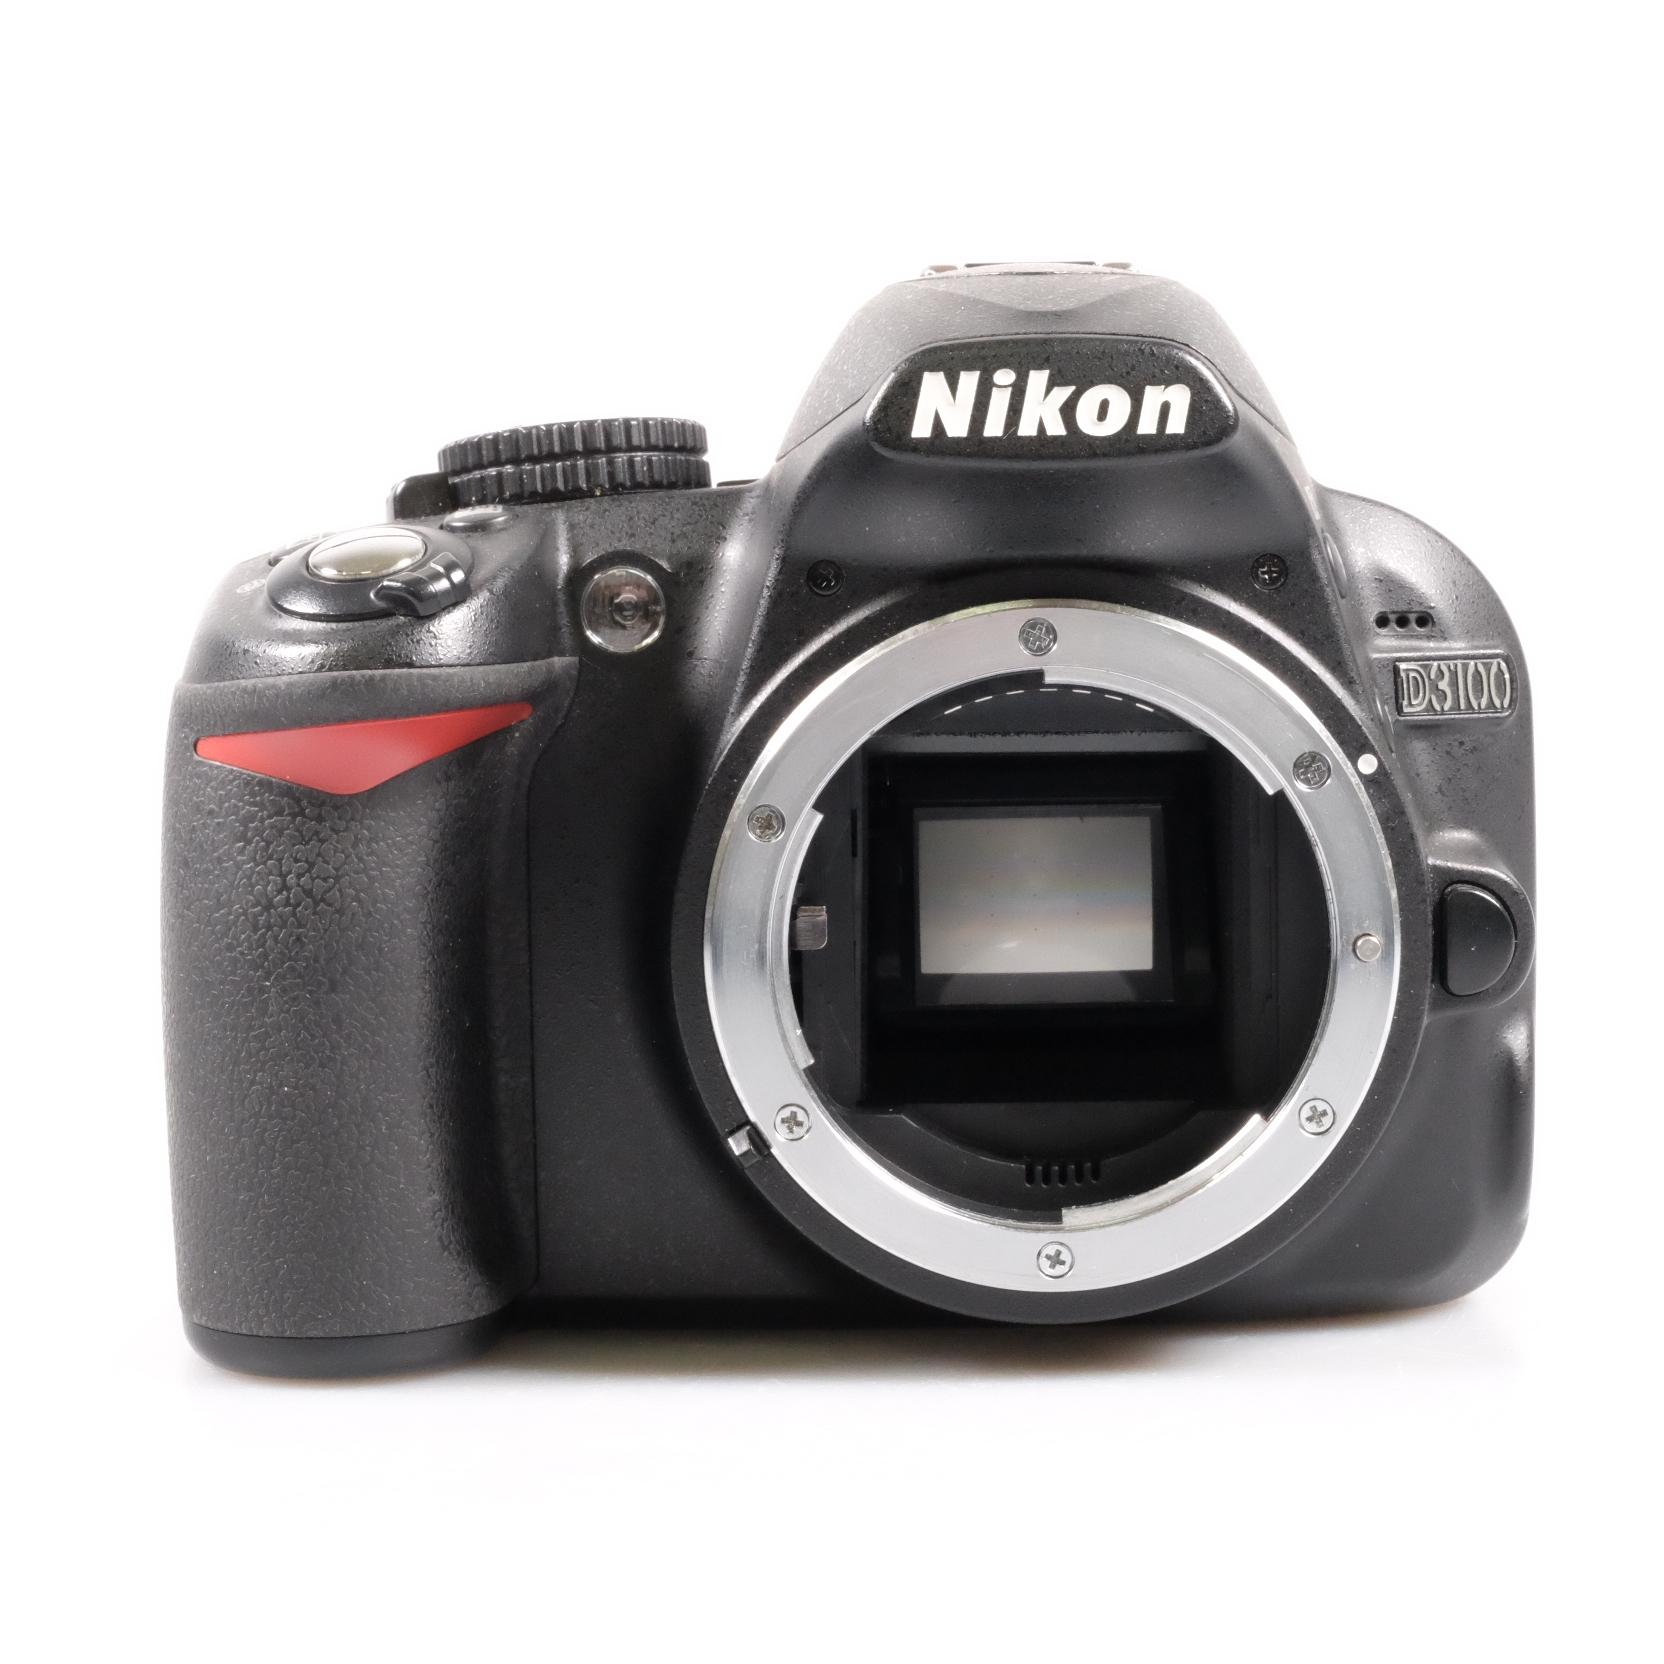 Used Nikon D3100 DSLR Camera Body (3,000 Shutter Count)